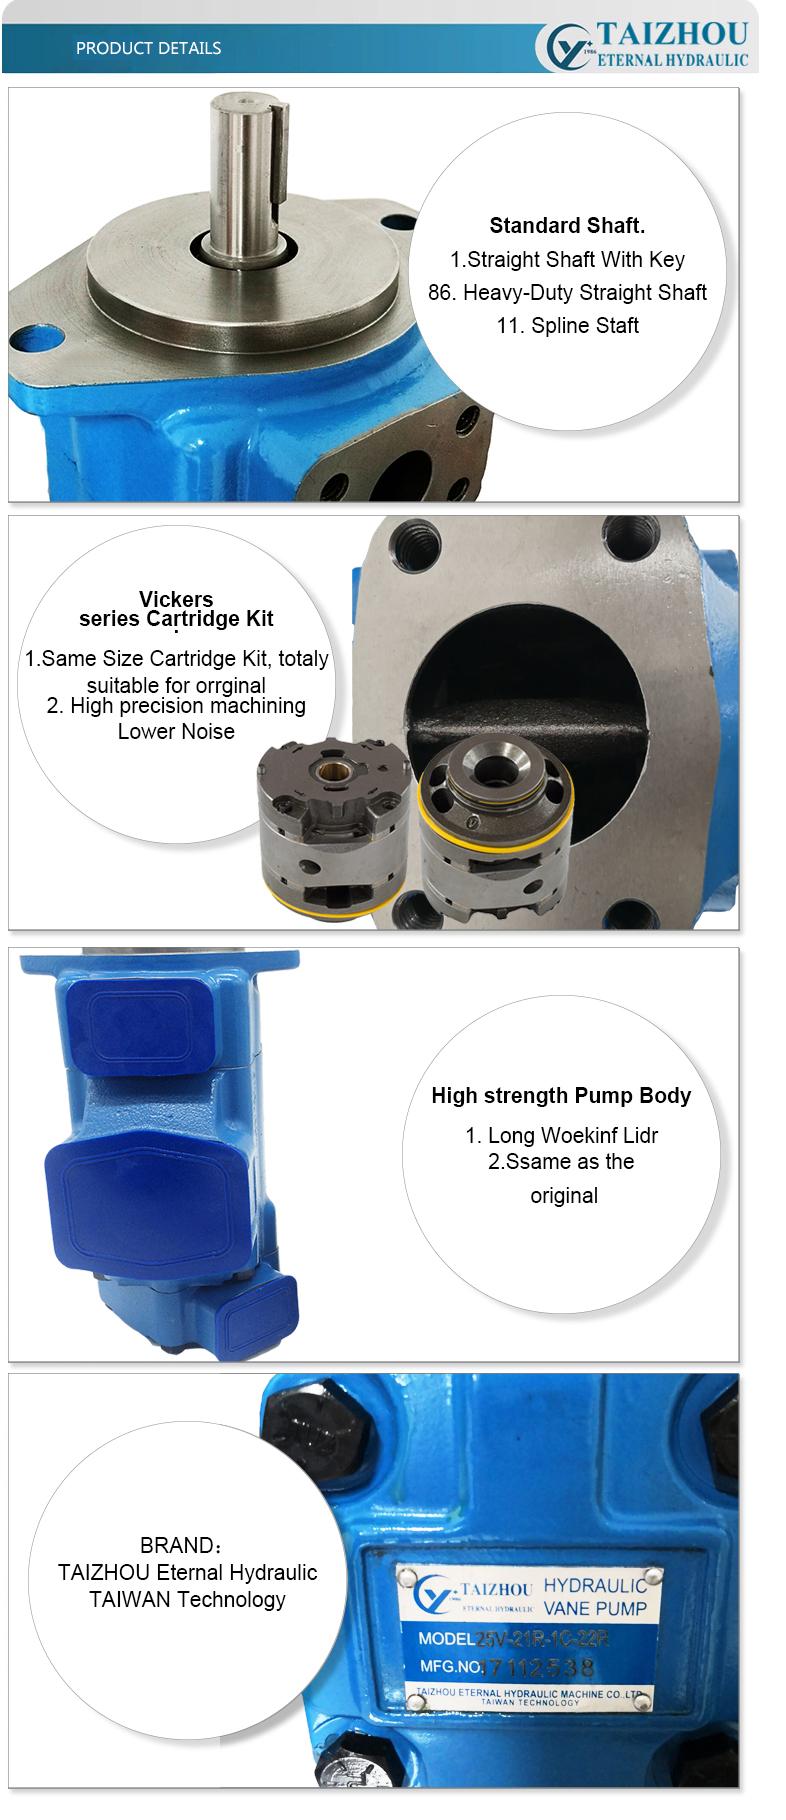 Hydraulic Double Vane Pump Oil Pump 2520VQ 3520VQ 3525VQ 4525VQ 4535VQ Vickers Pumps